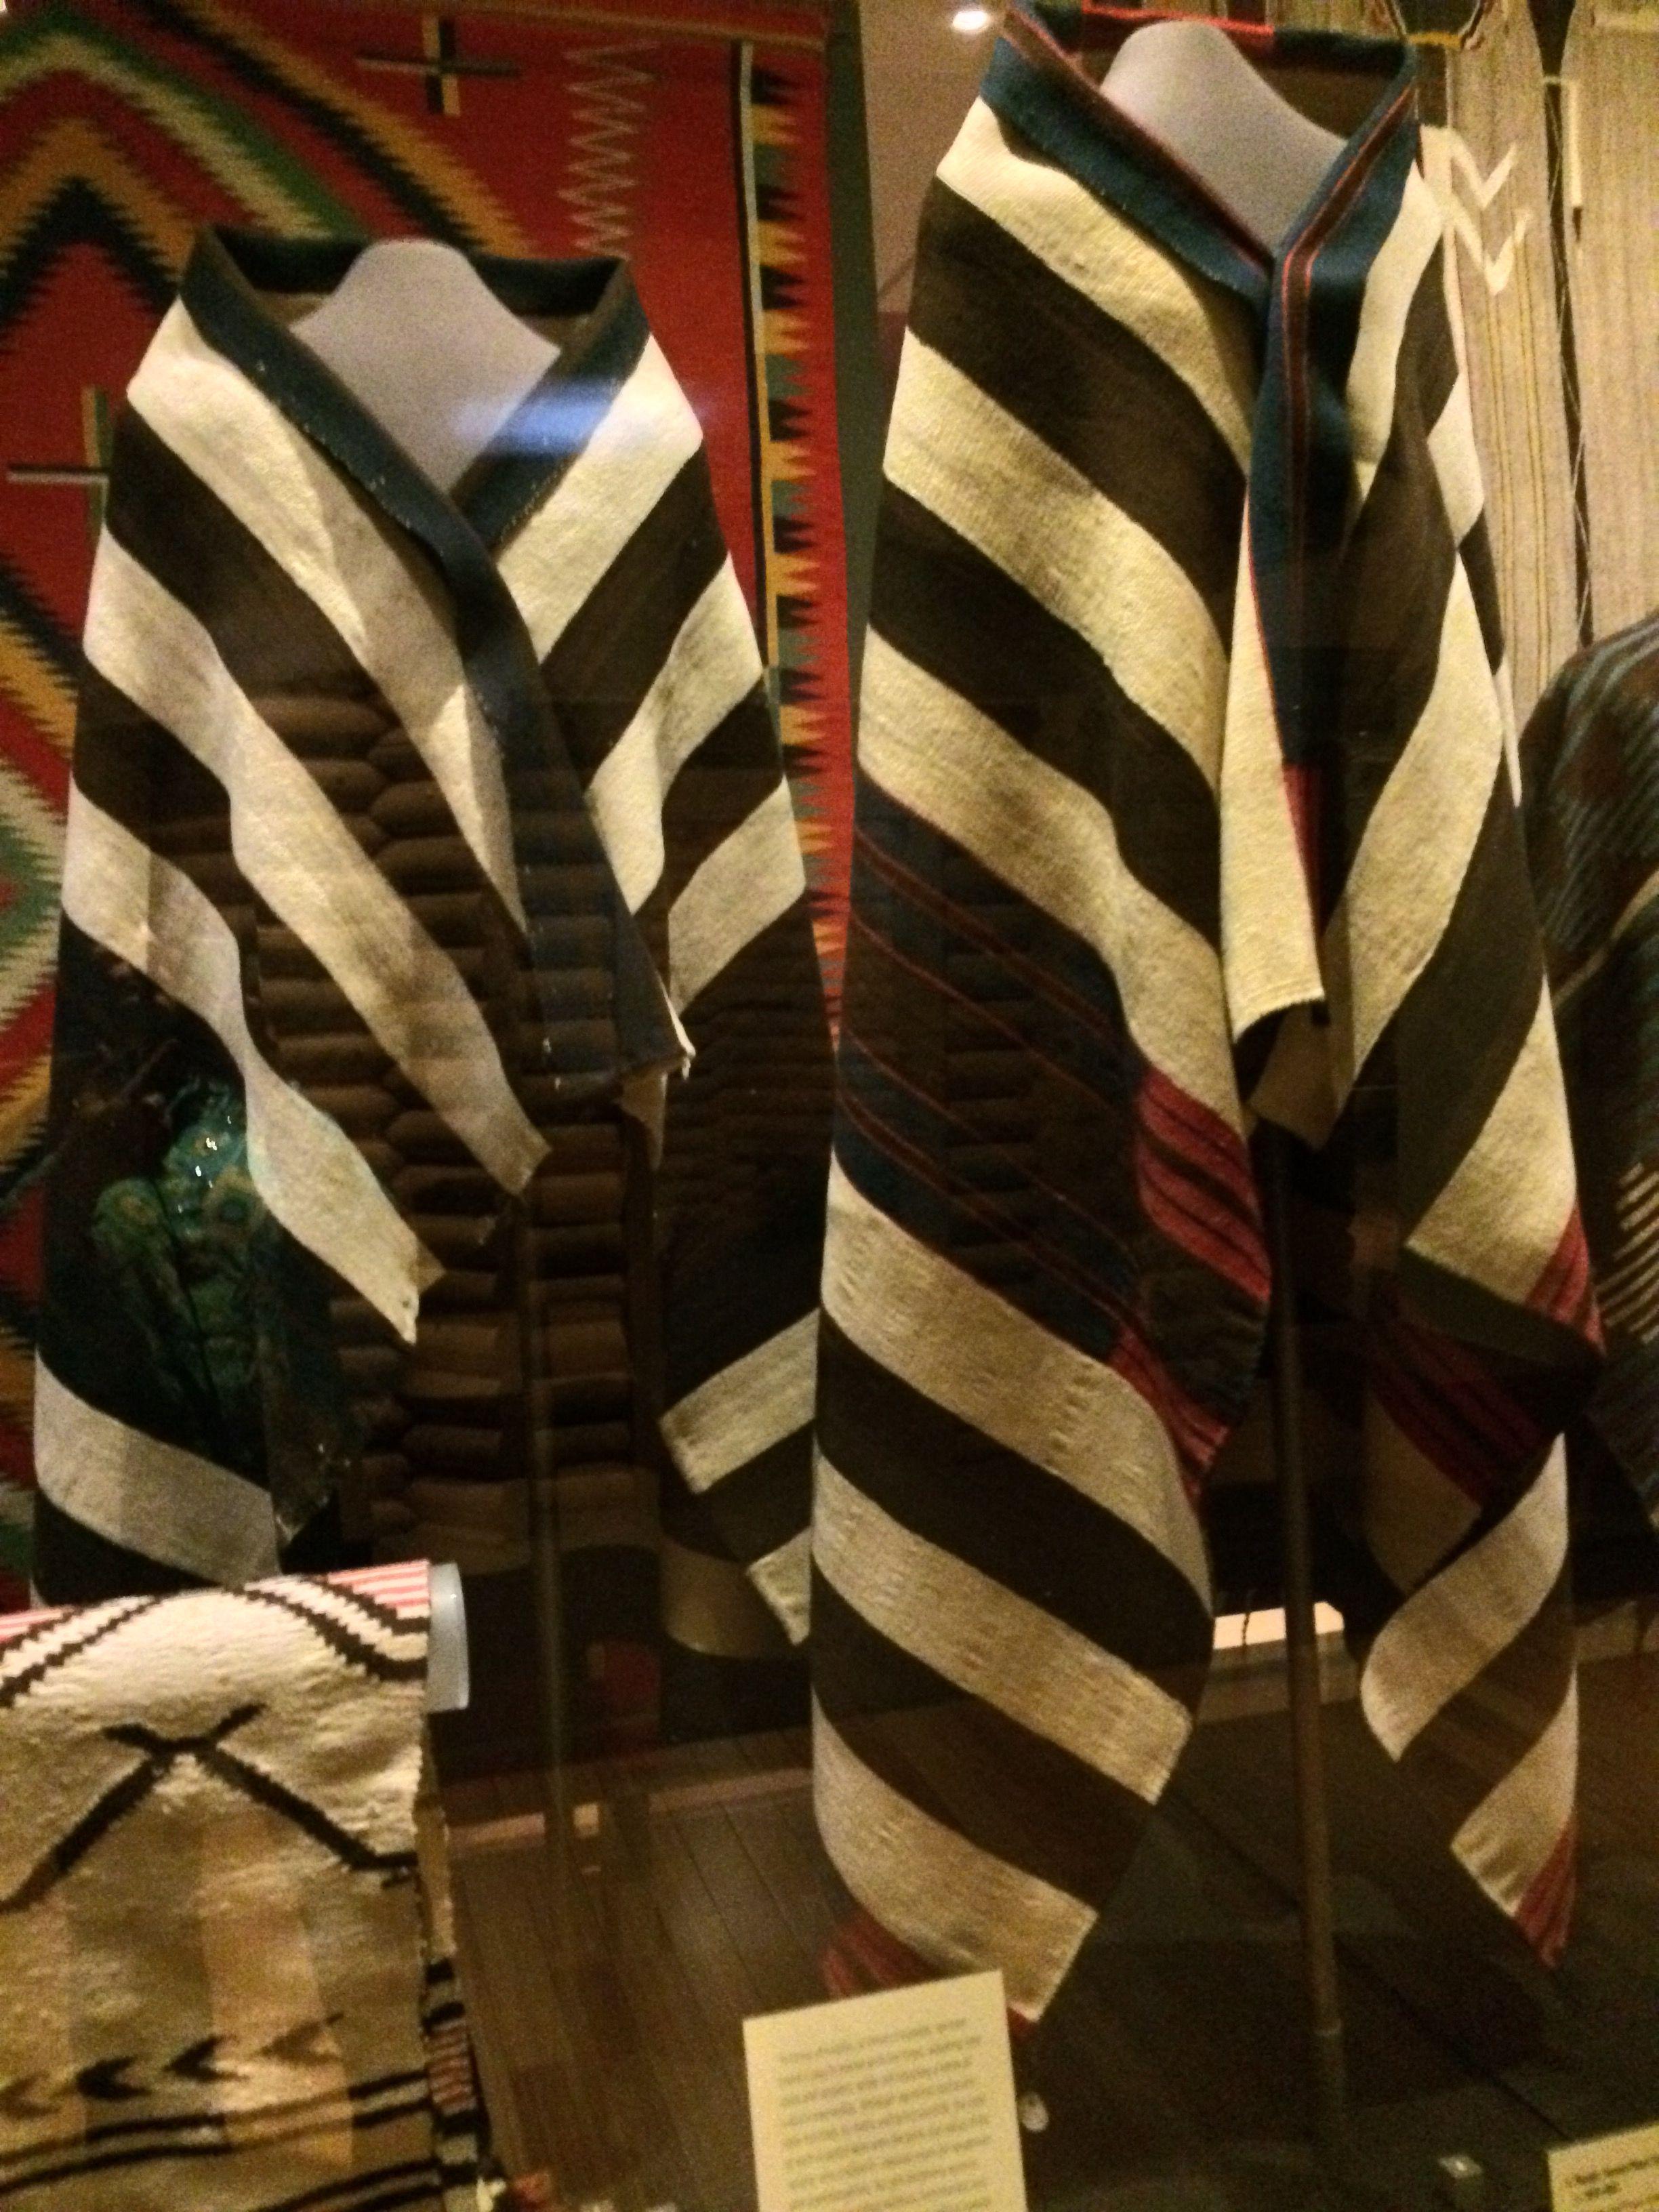 Navajo 1st phase chief's blanket (left) 1800-1850 and 2nd phase chief's blanket 1850-1865 (right) at the Heard Museum of Native American art in Phoenix, Arizona